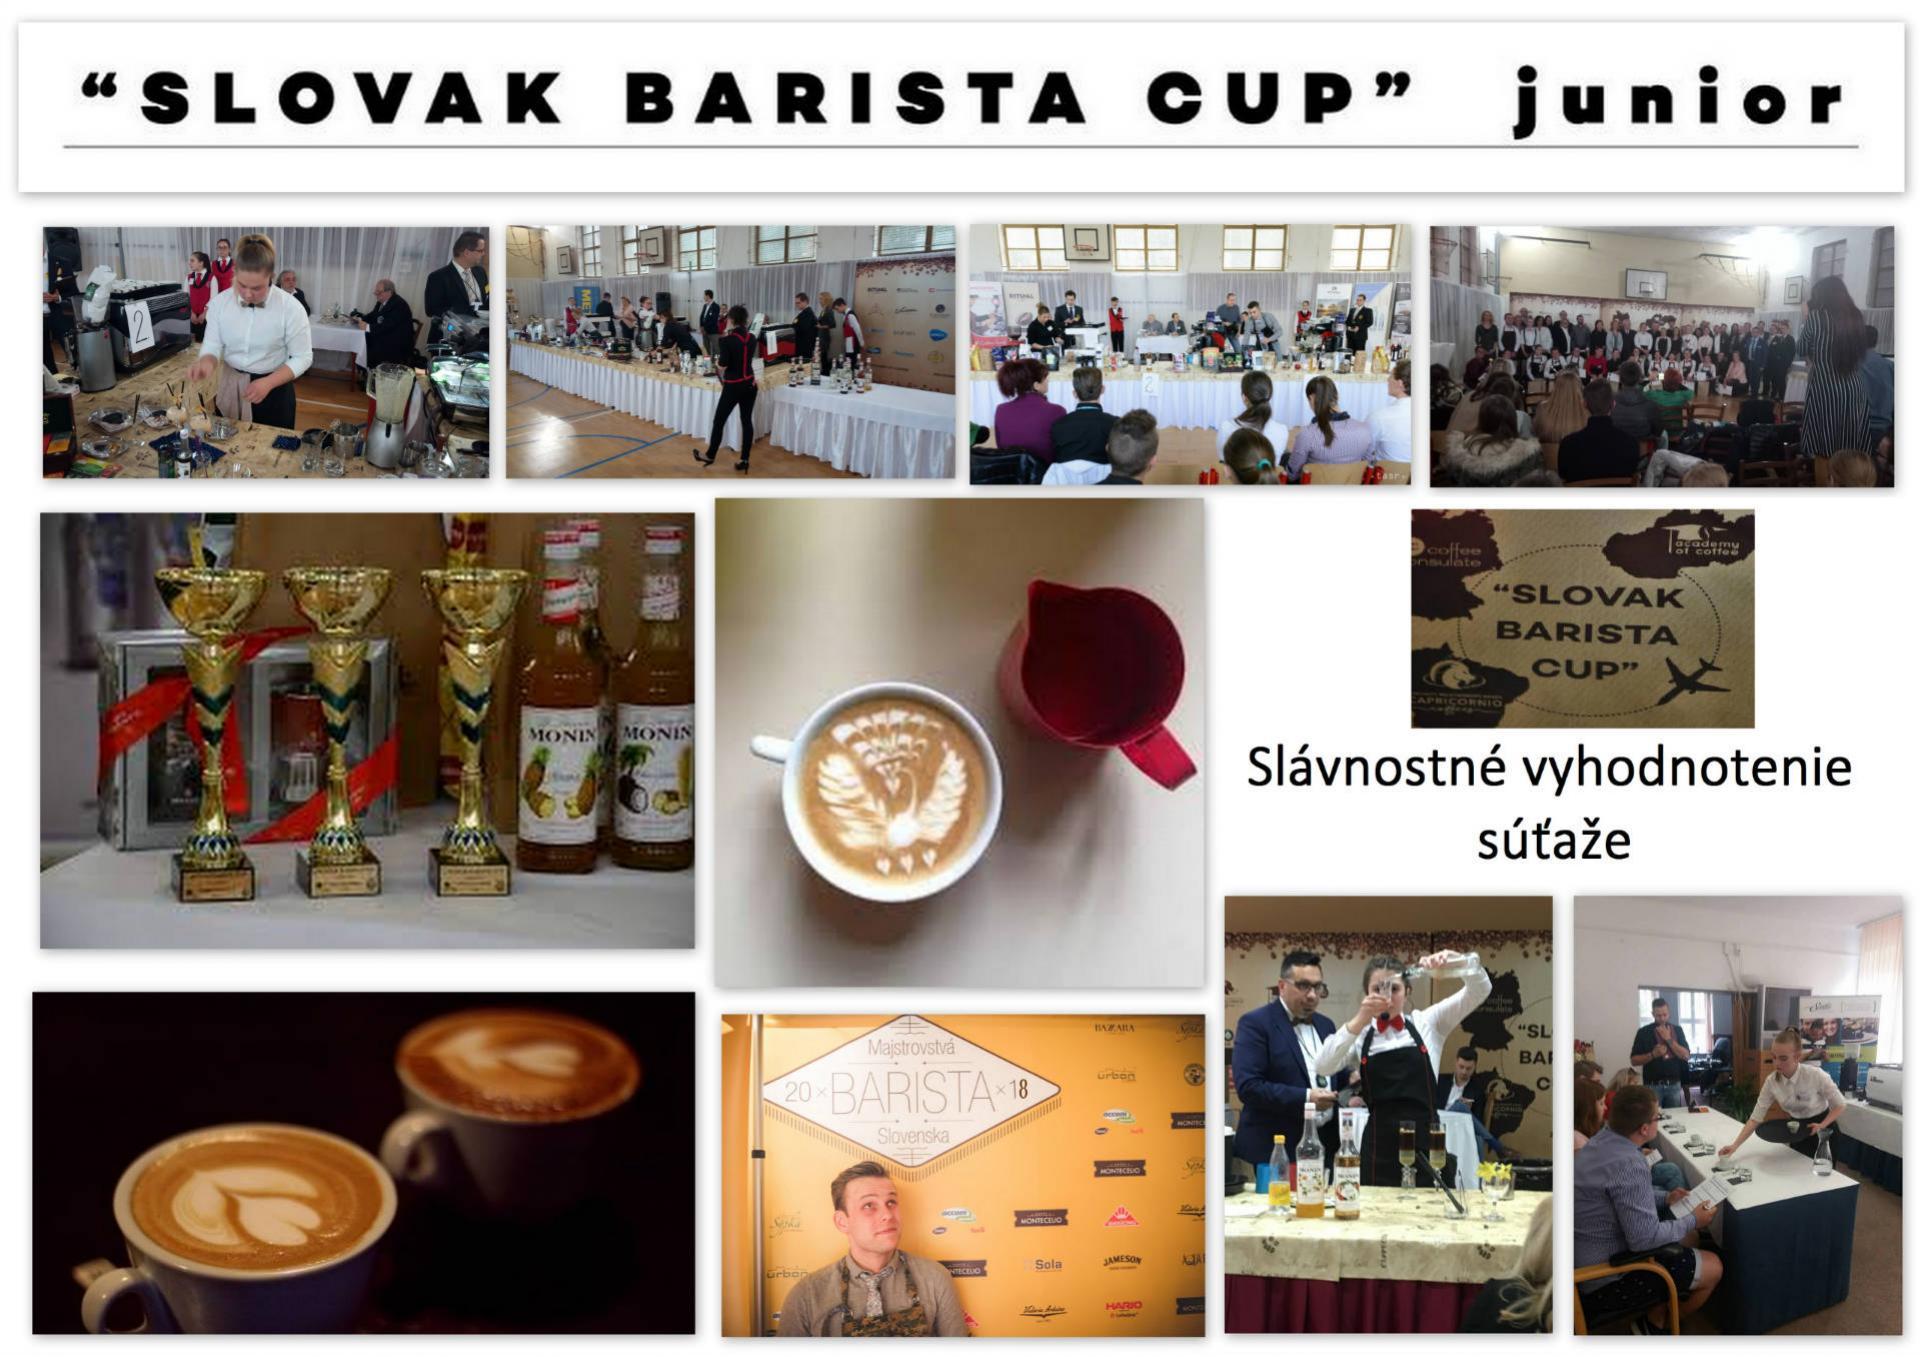 SLOVAK BARISTA CUP JUNIOR 2018 NITRA